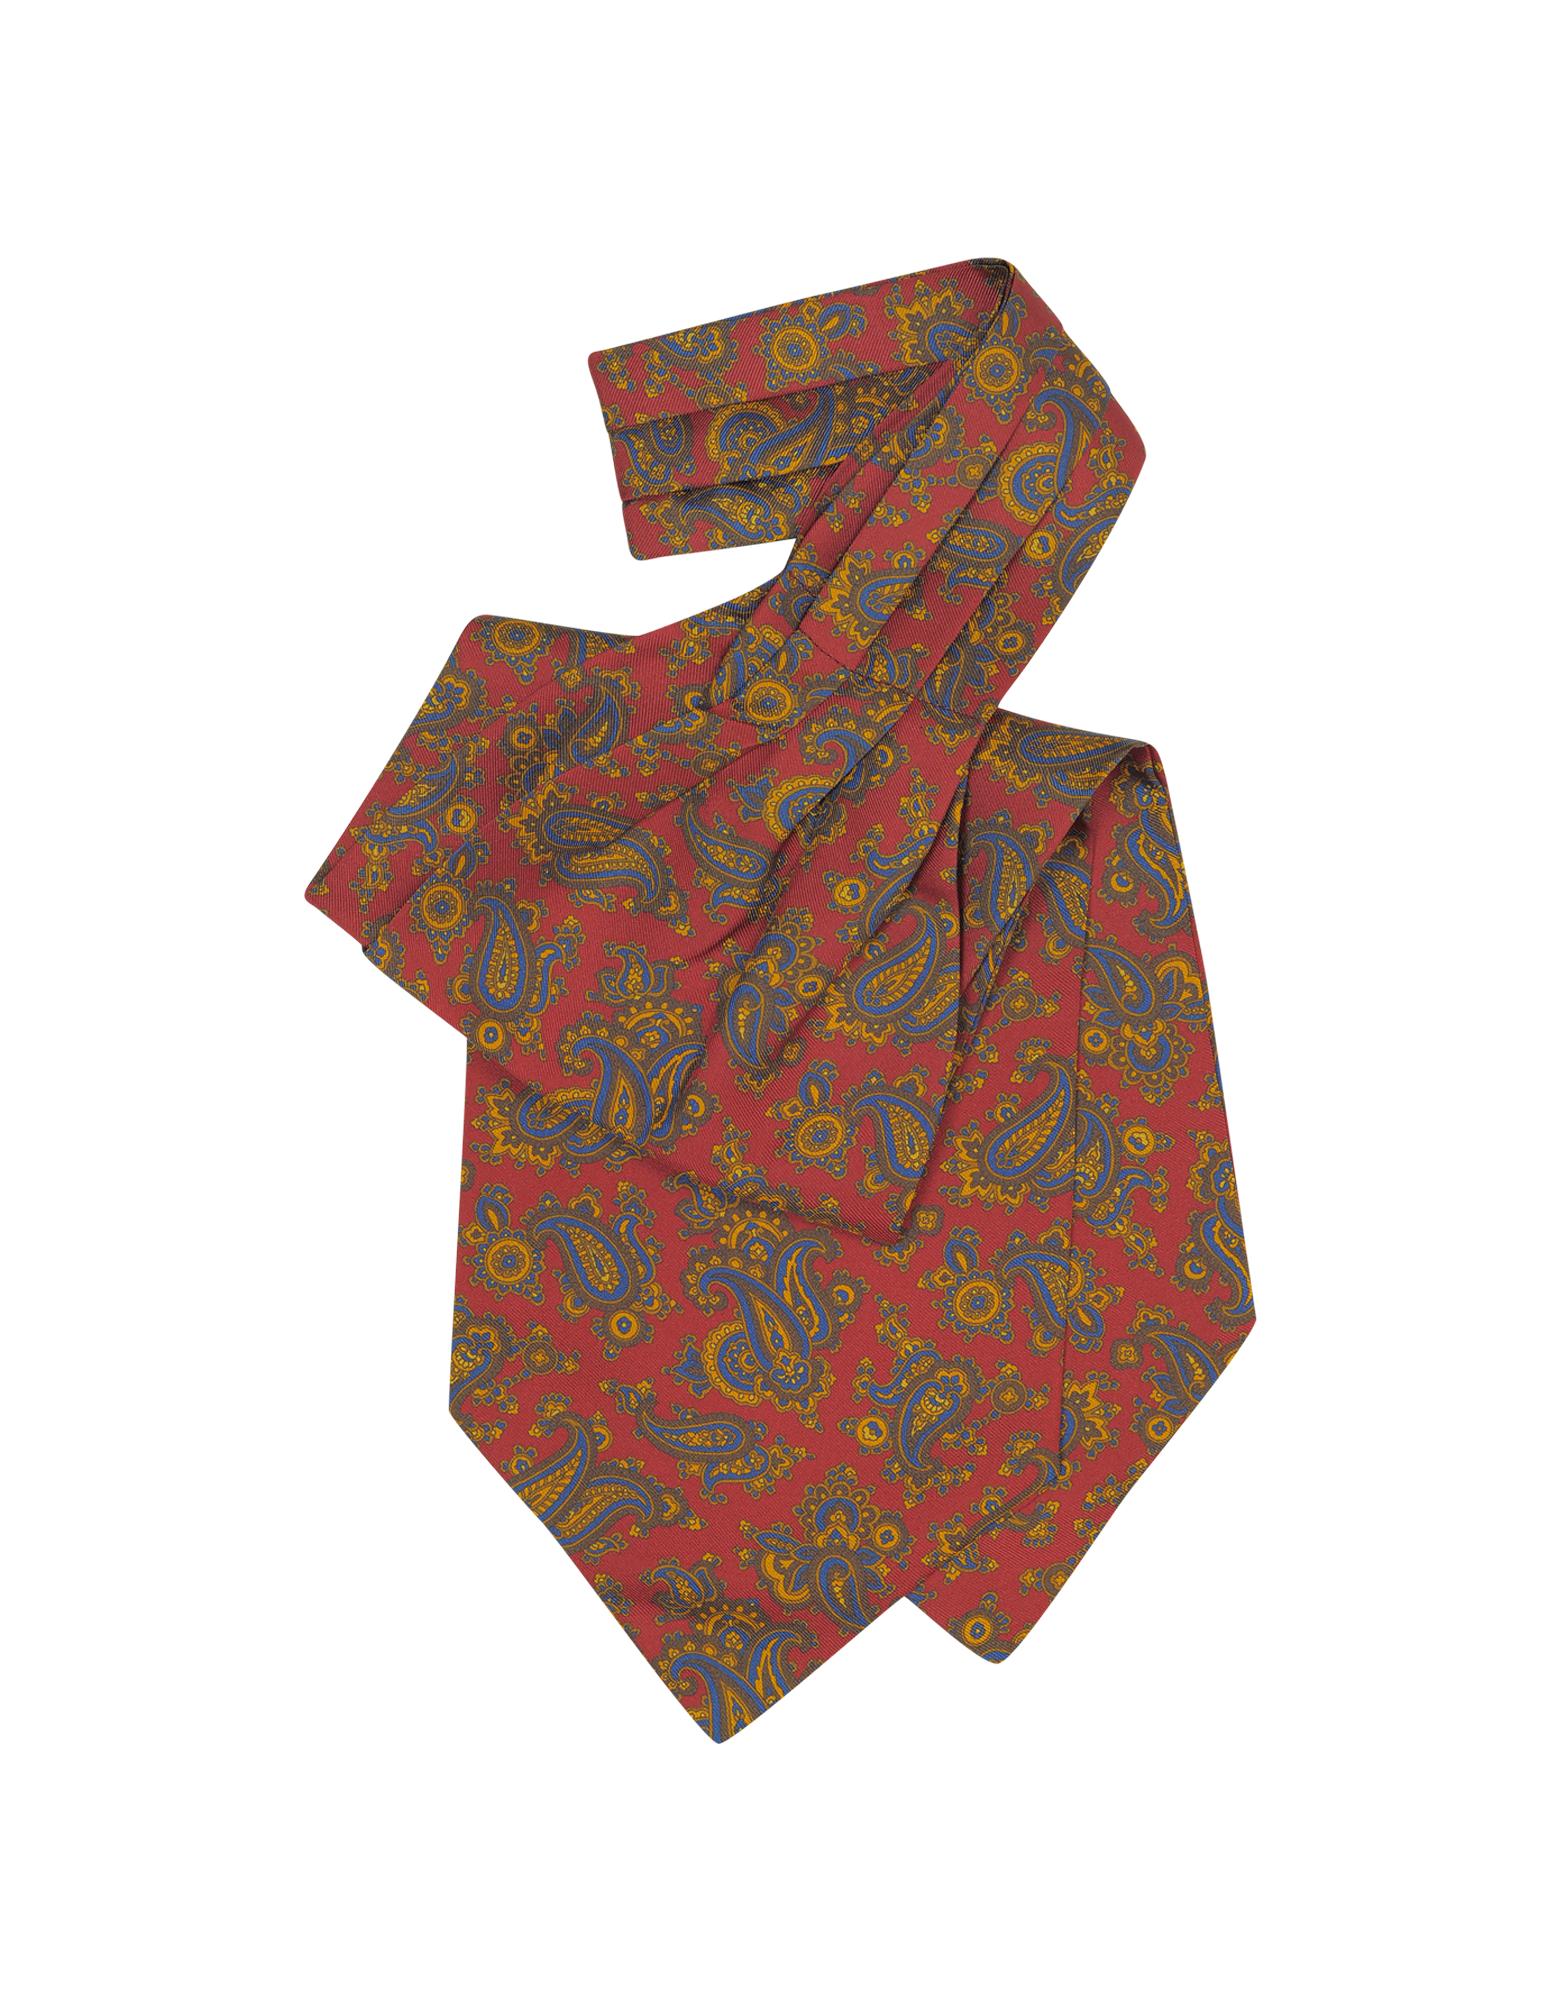 Image of Large Paisley Print Silk Ascot